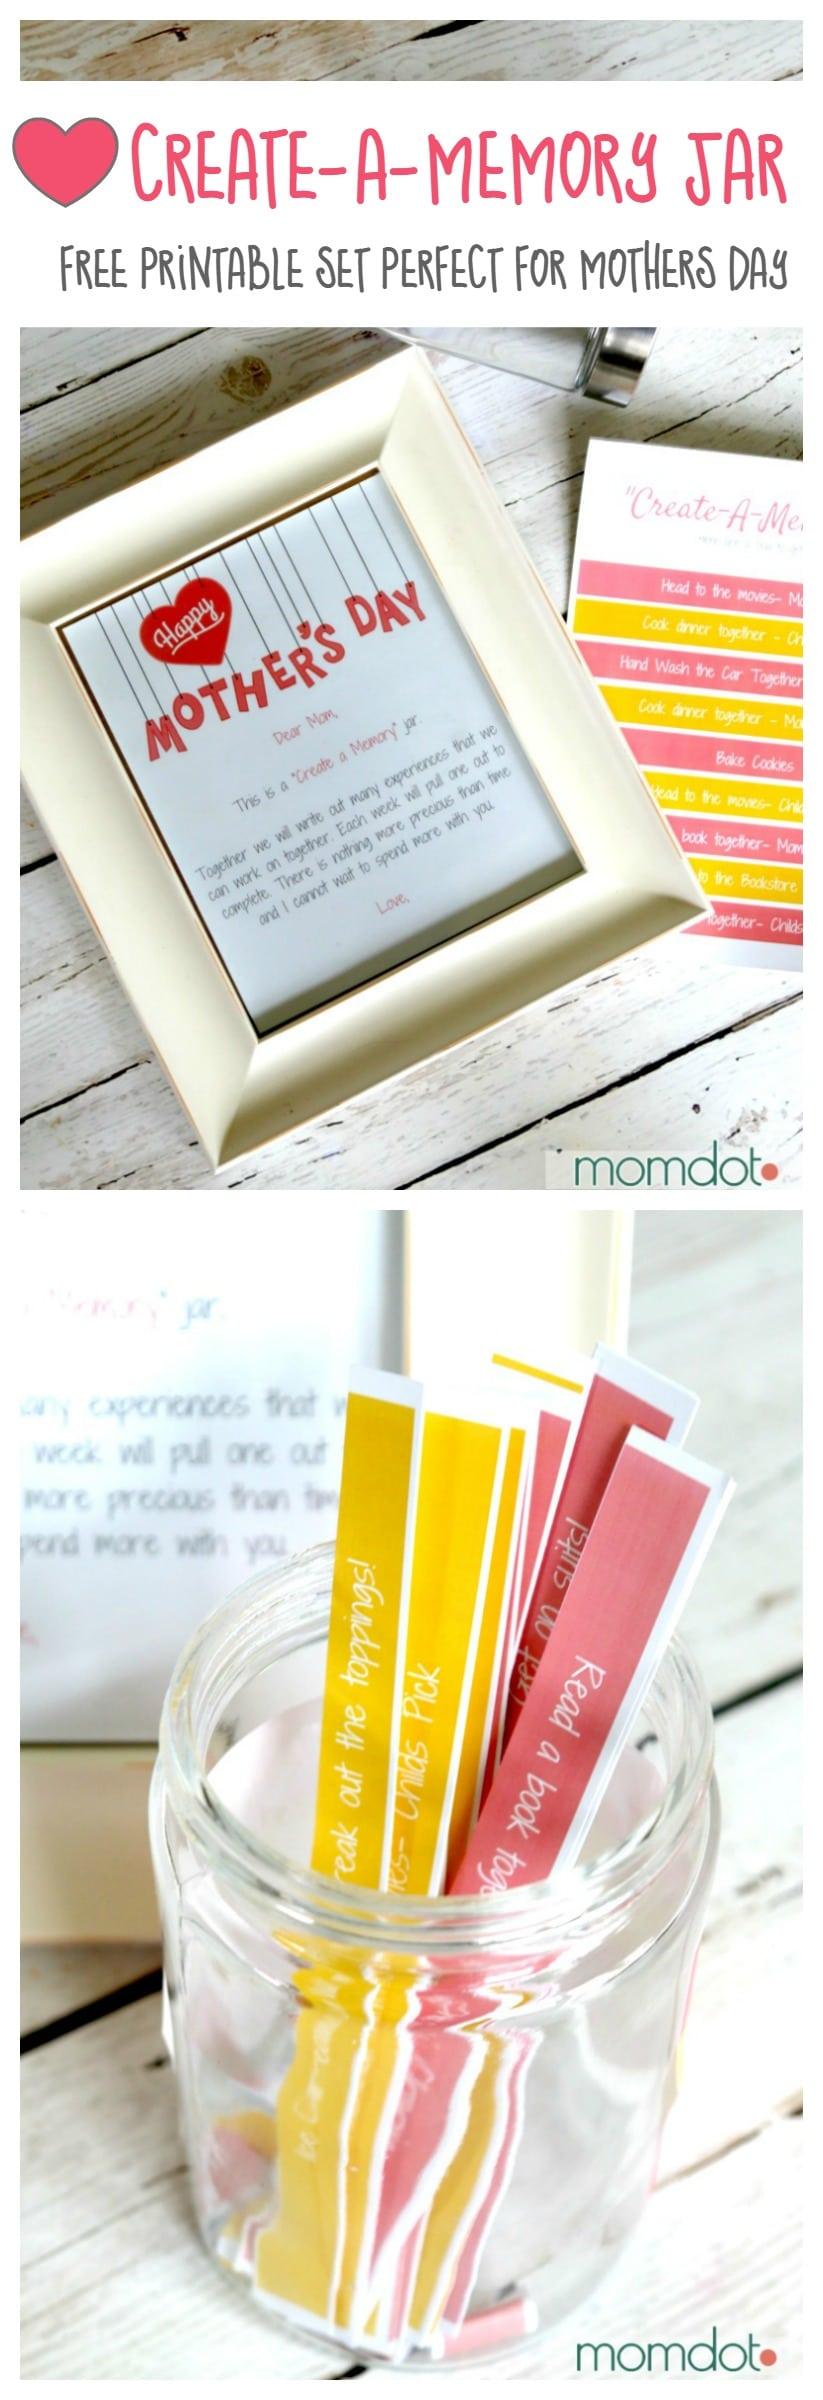 Free Printable: Create a Memory Mason Jar idea, with full set of free printables to bring this fun memory and activity jar to life.